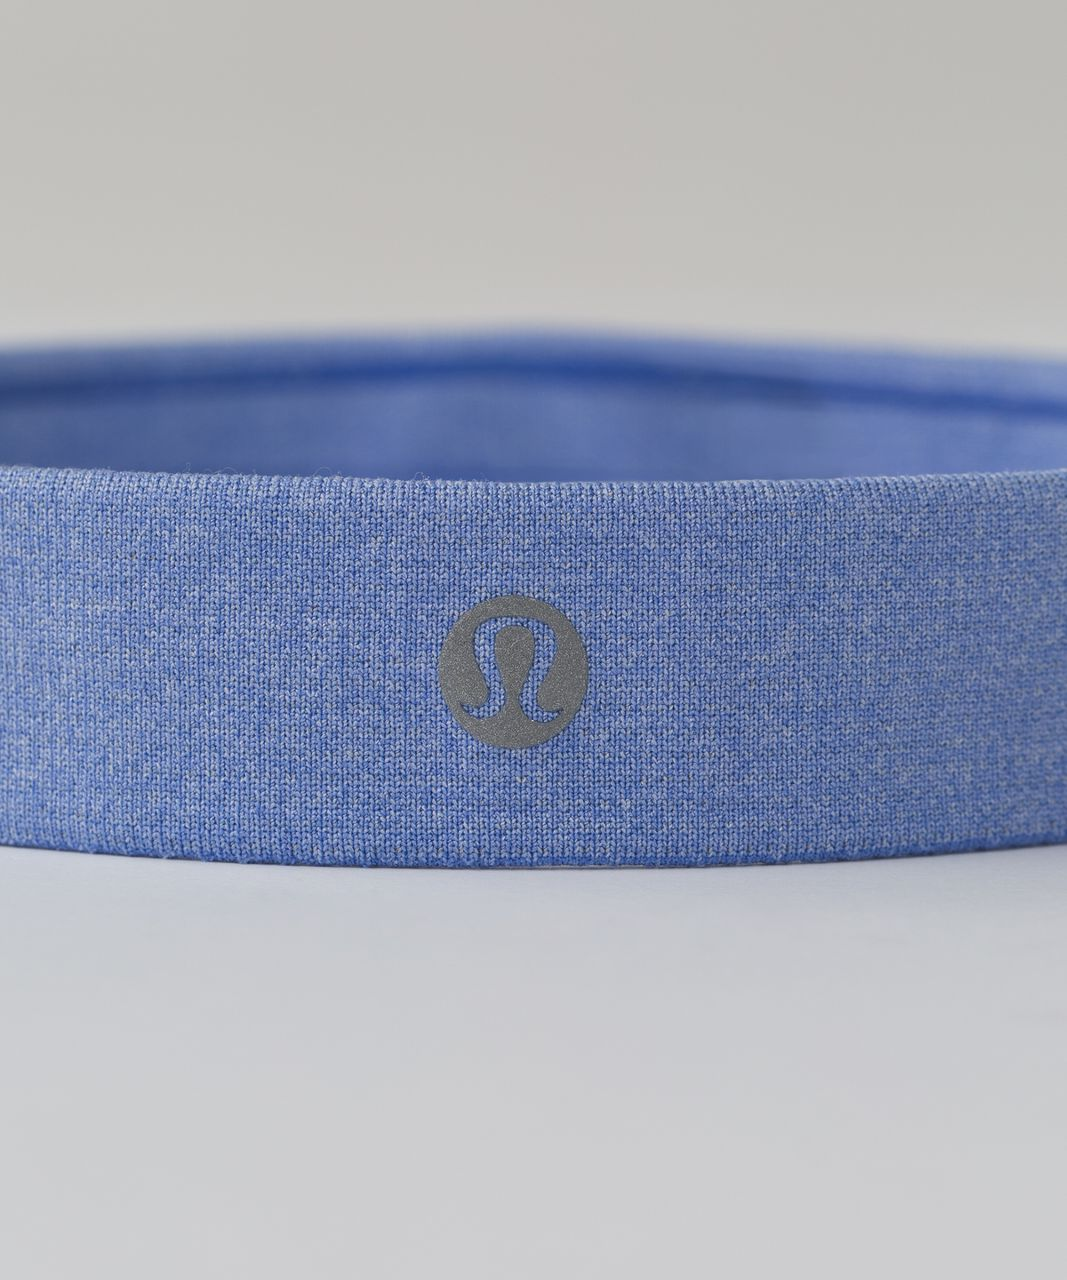 Lululemon Cardio Cross Trainer Headband - Heathered Lullaby